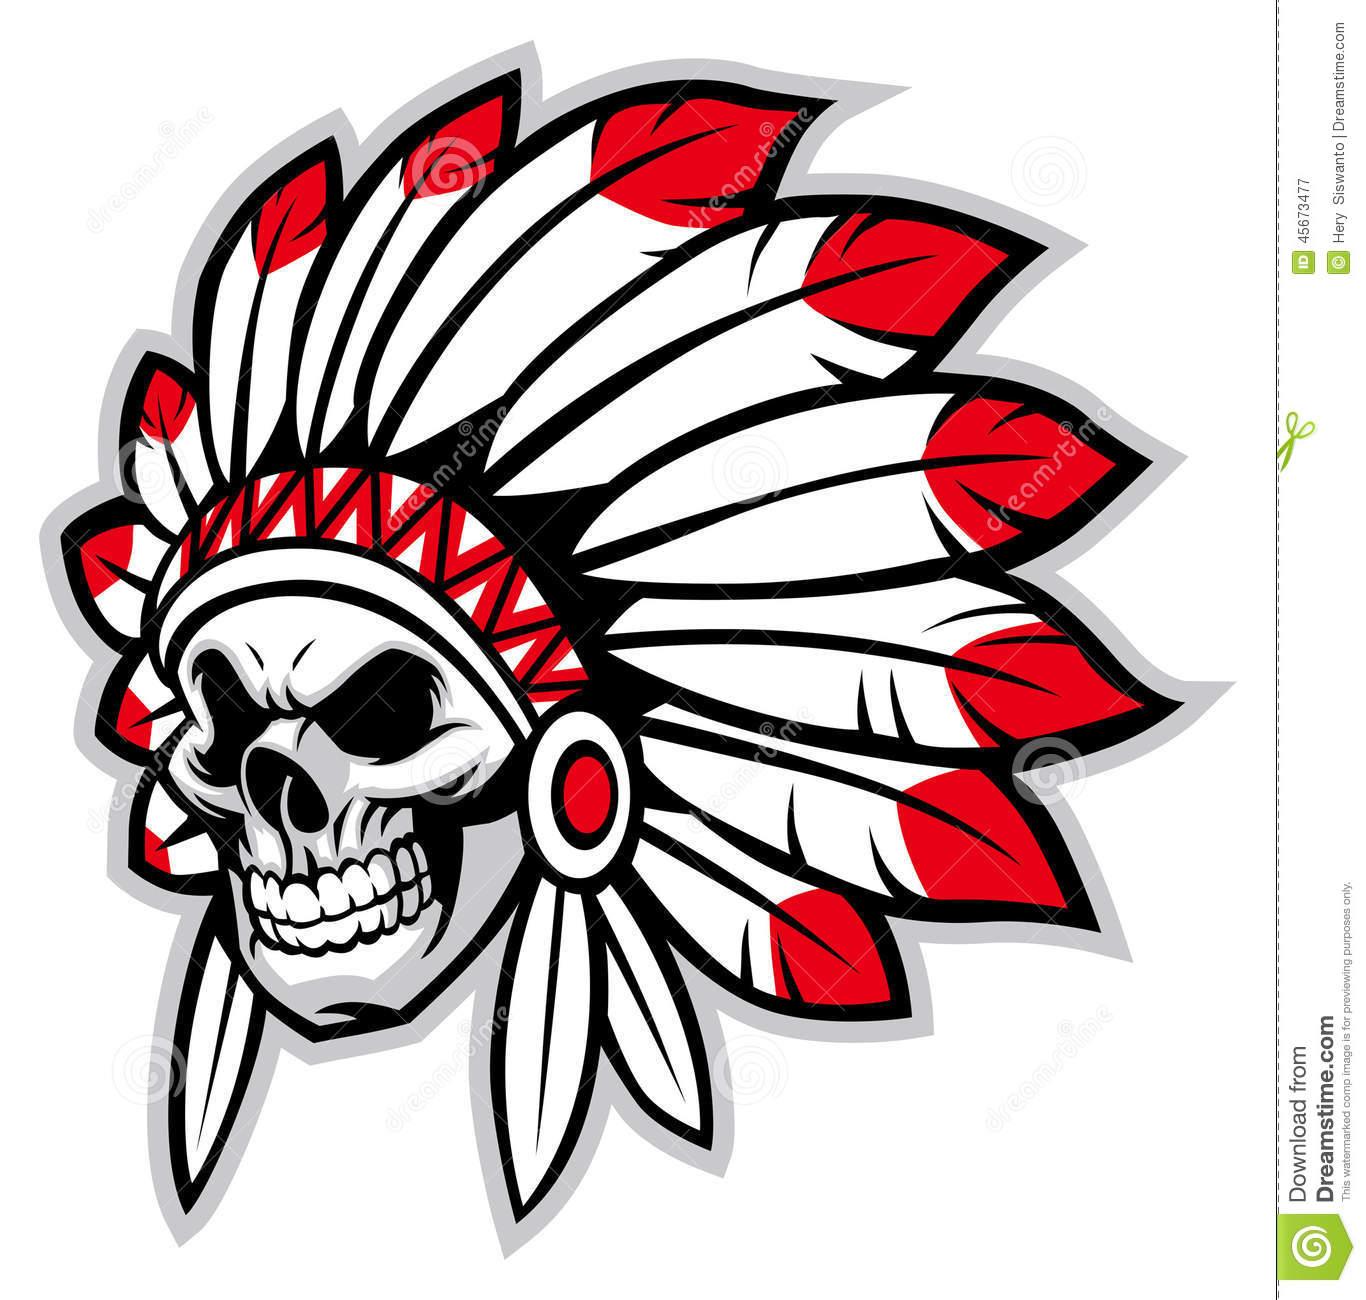 Indian Chief Head Clip Art ..-Indian Chief Head Clip Art ..-8